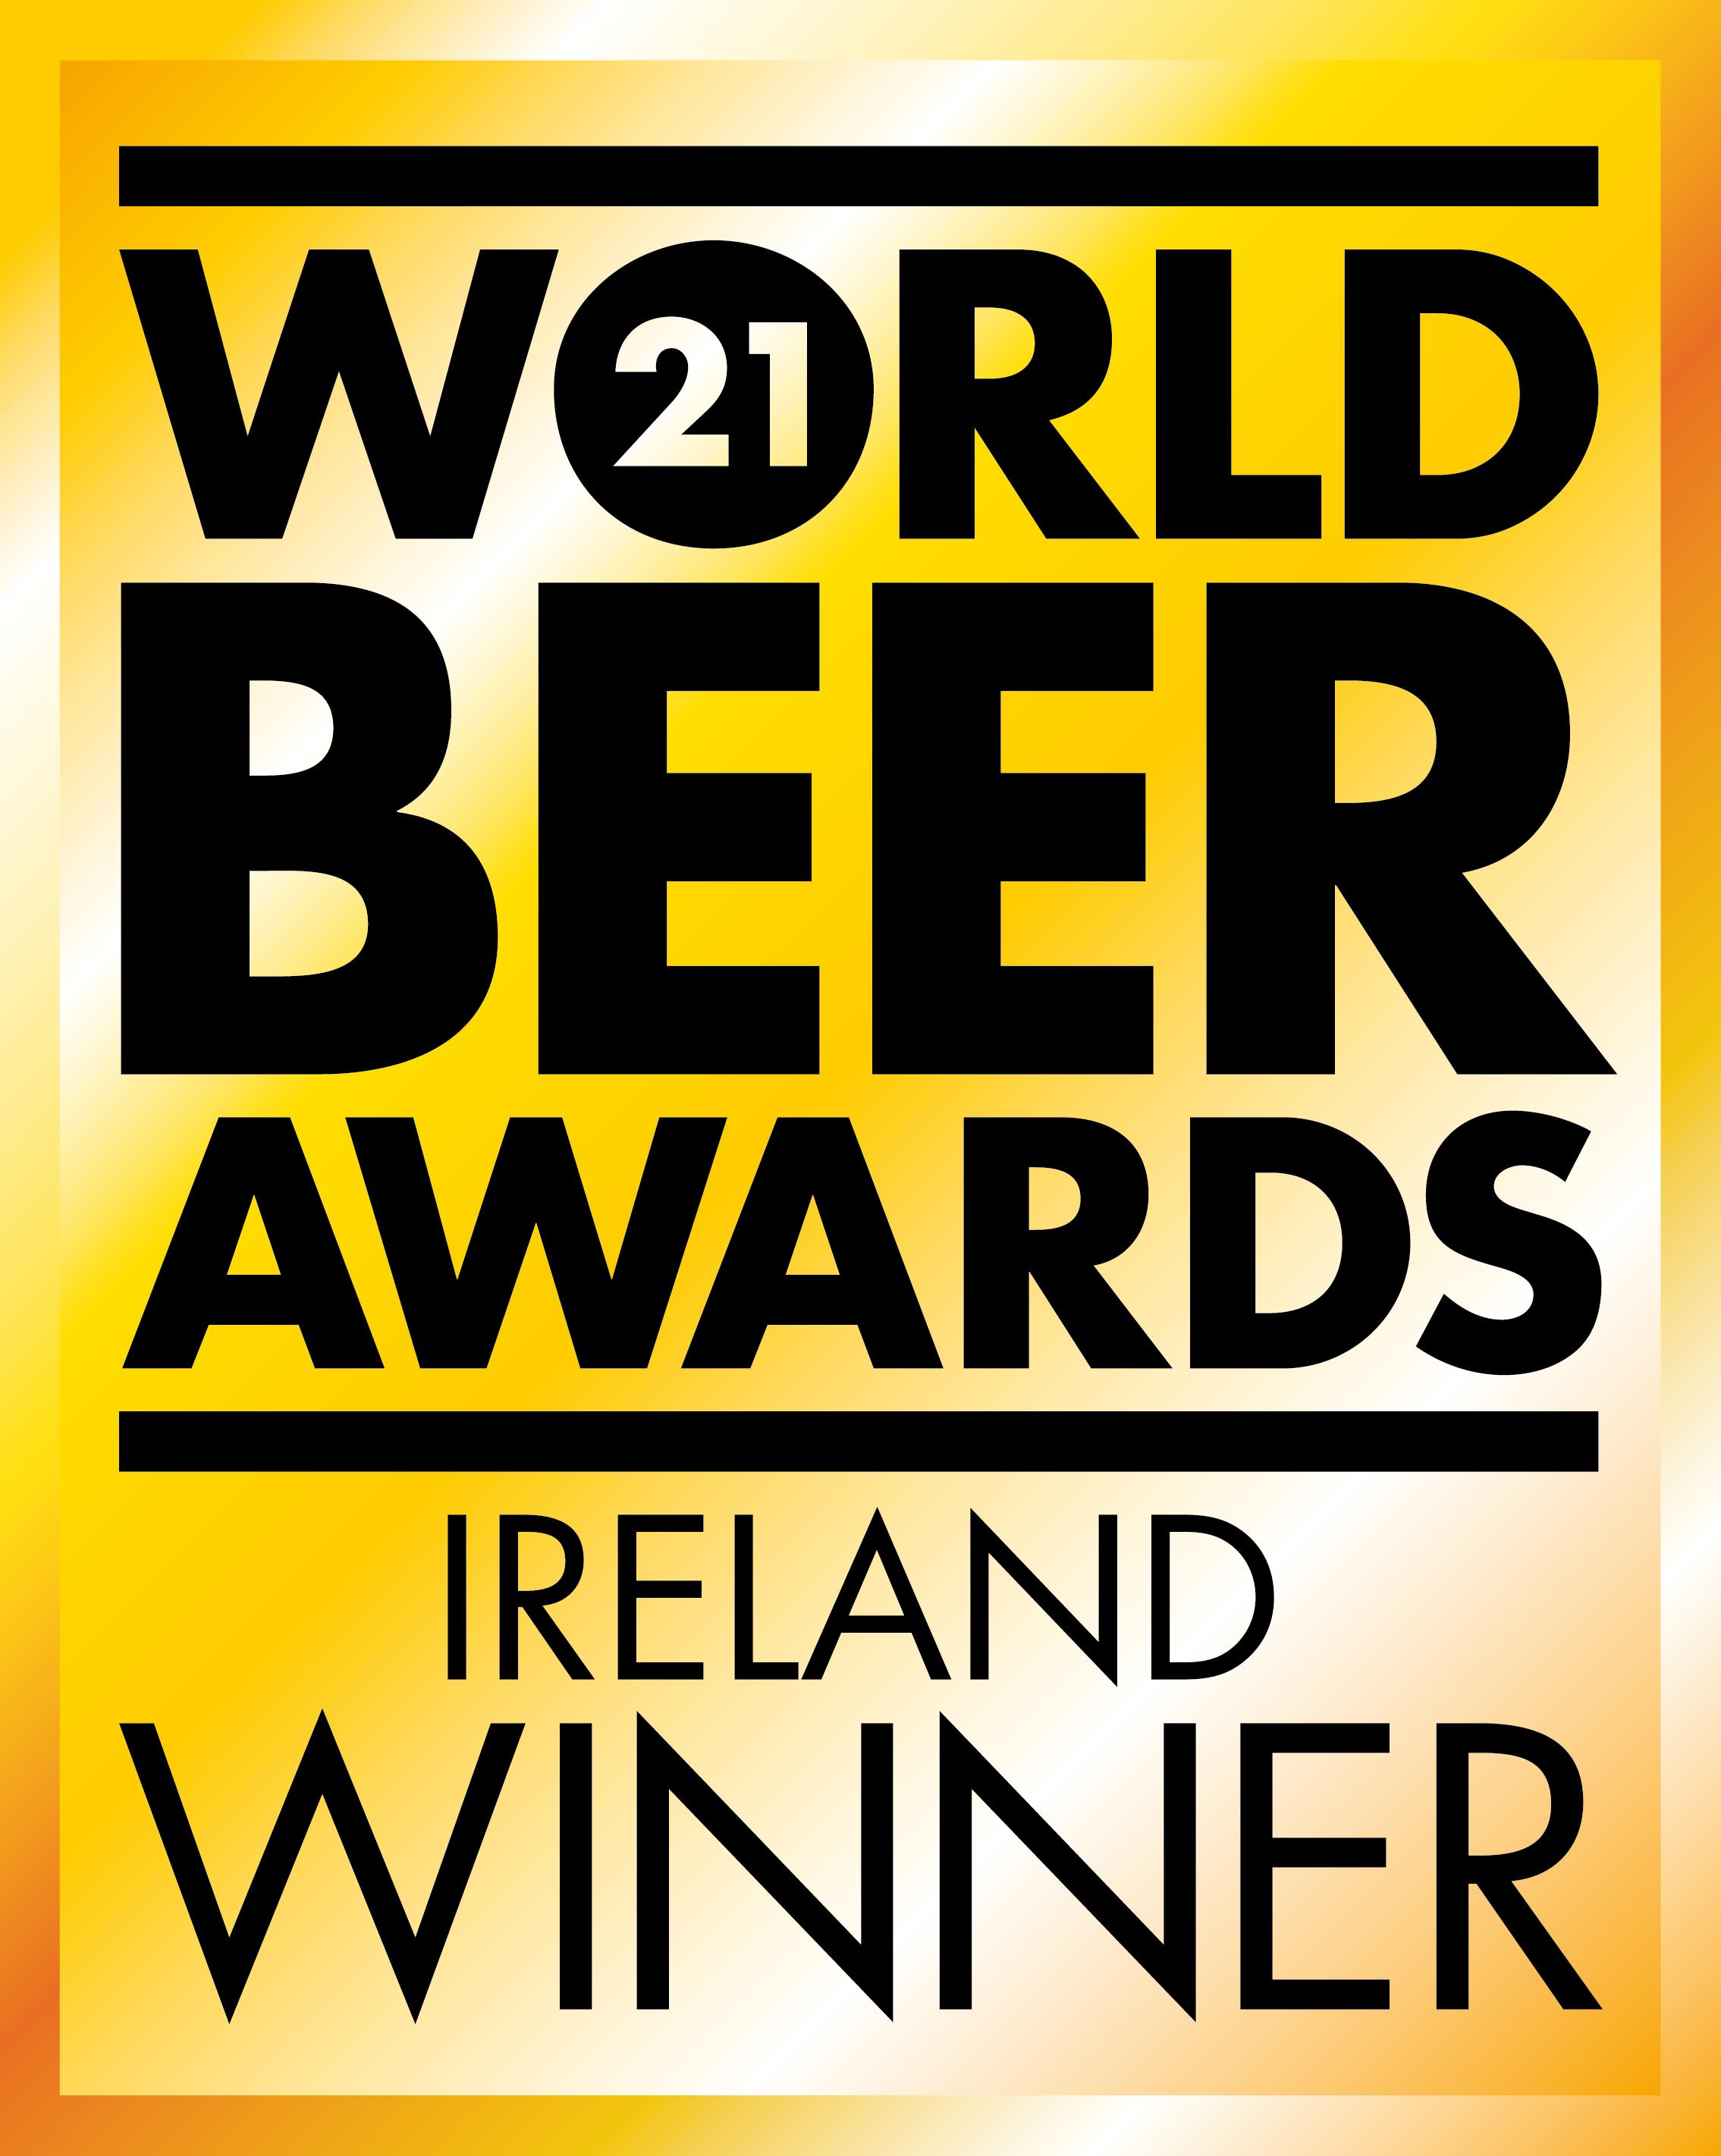 Seisiún, Sunburnt take Best in Ireland at 2021 World Beer Awards thumbnail